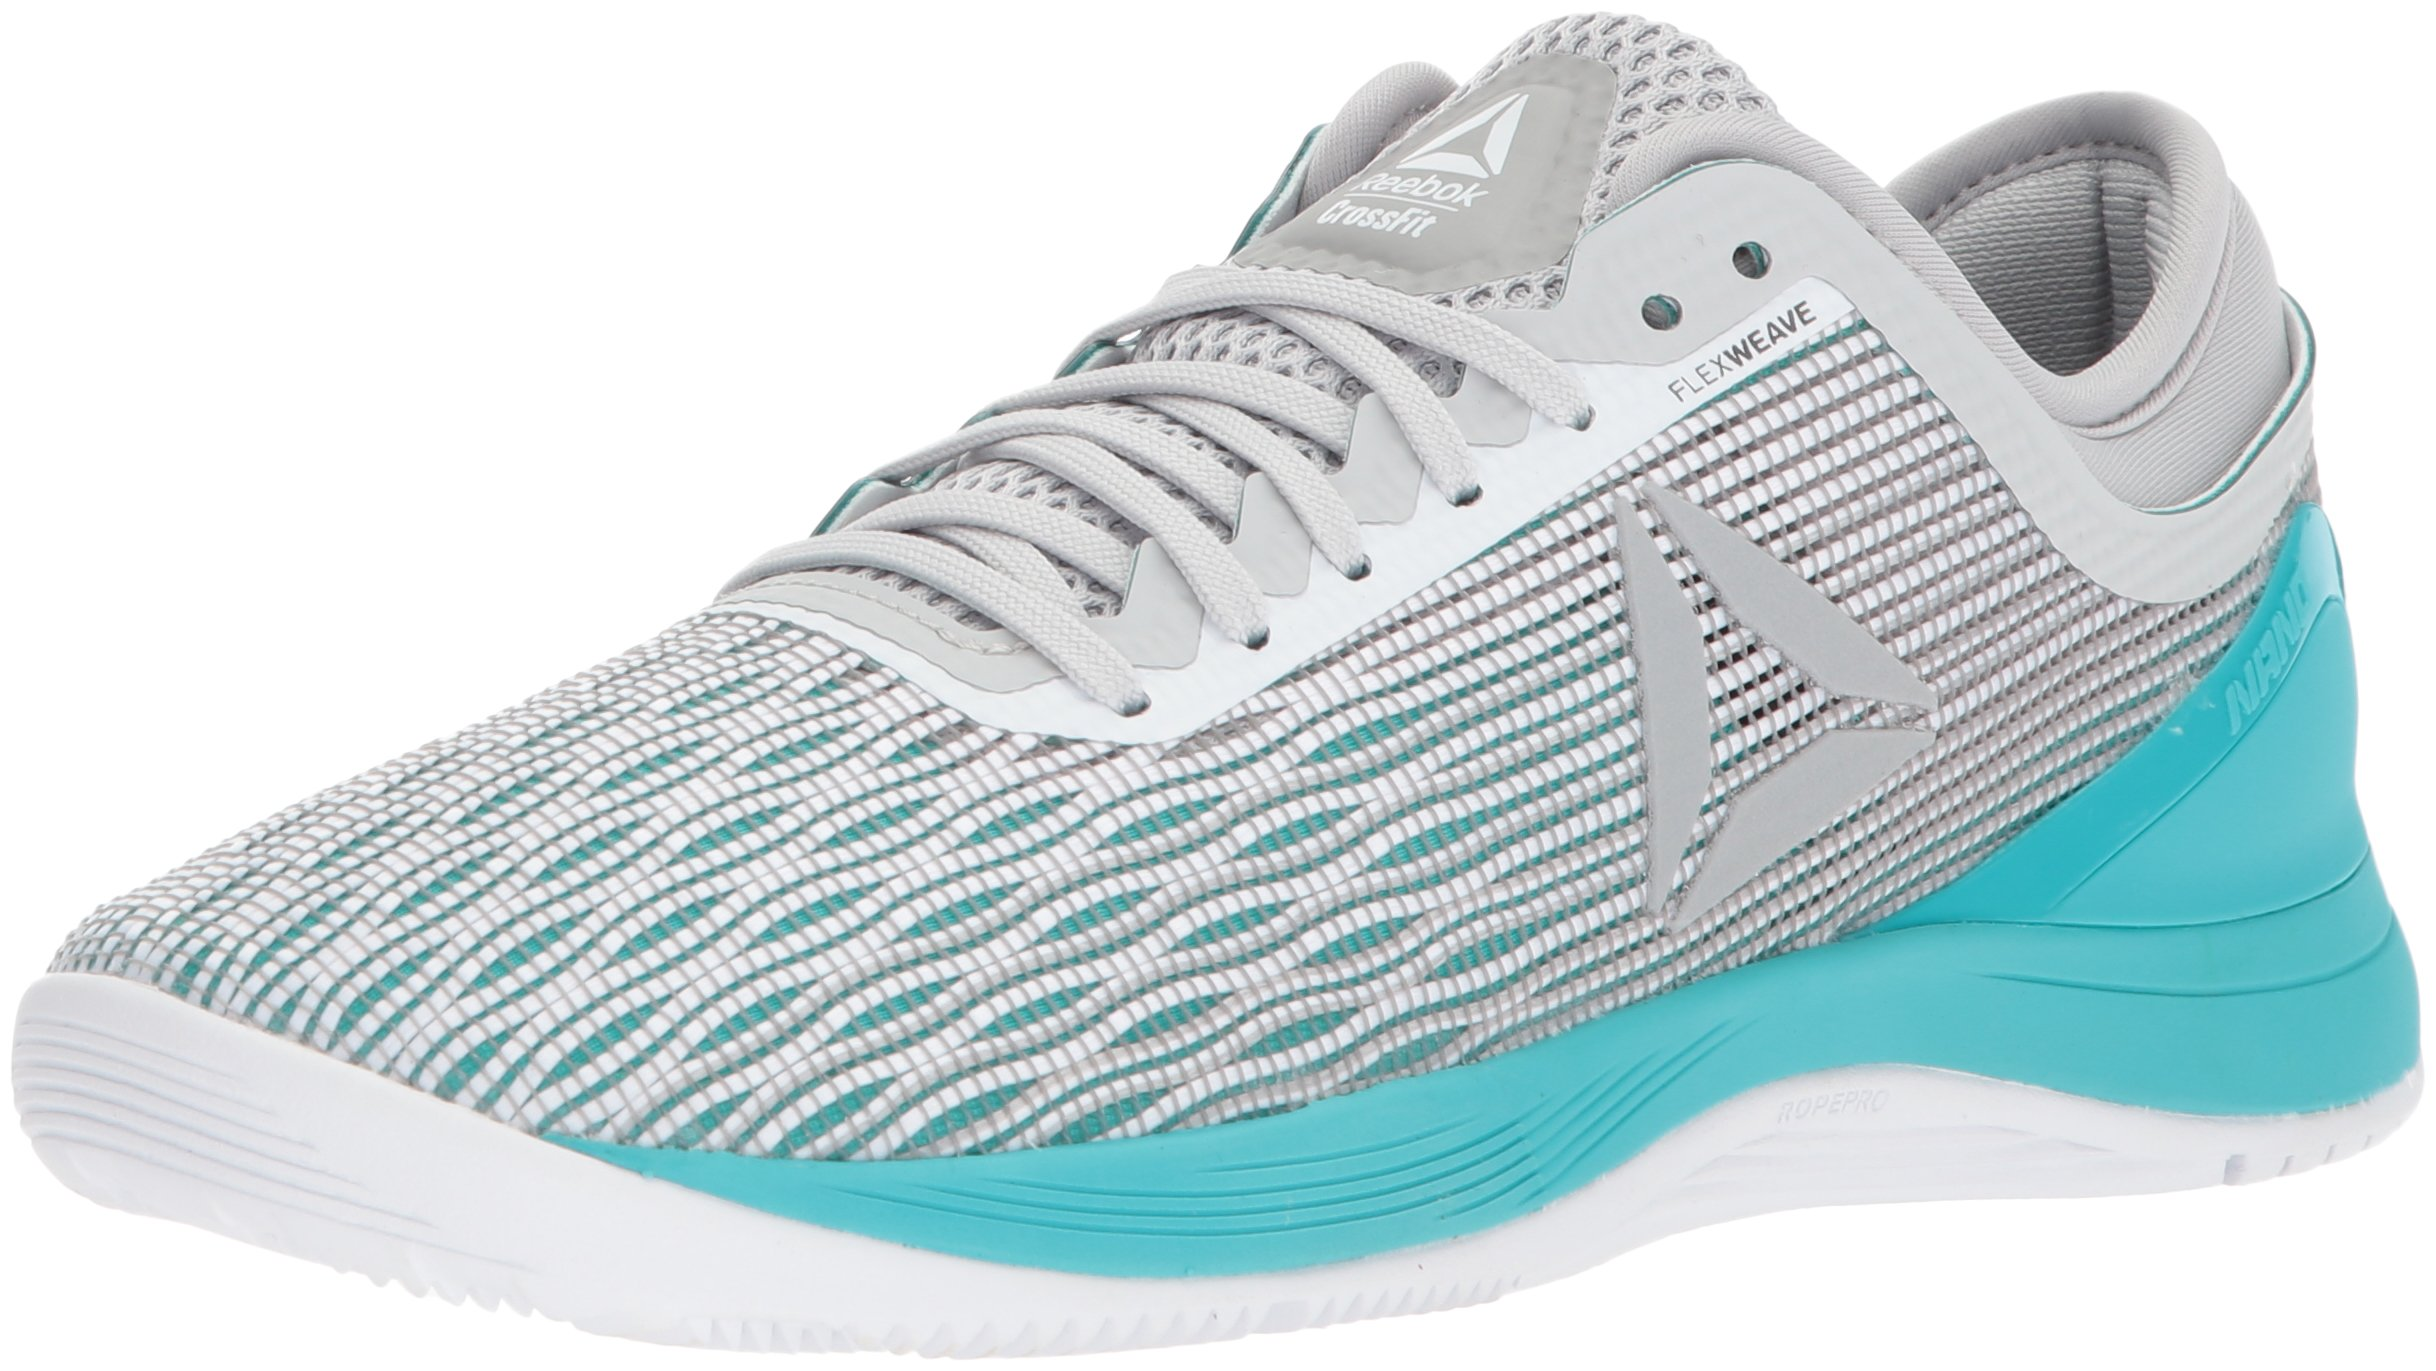 Reebok Women's CROSSFIT Nano 8.0 Flexweave Cross Trainer, White/Stark Grey/Grey/Classic White/Turquoise, 9 M US